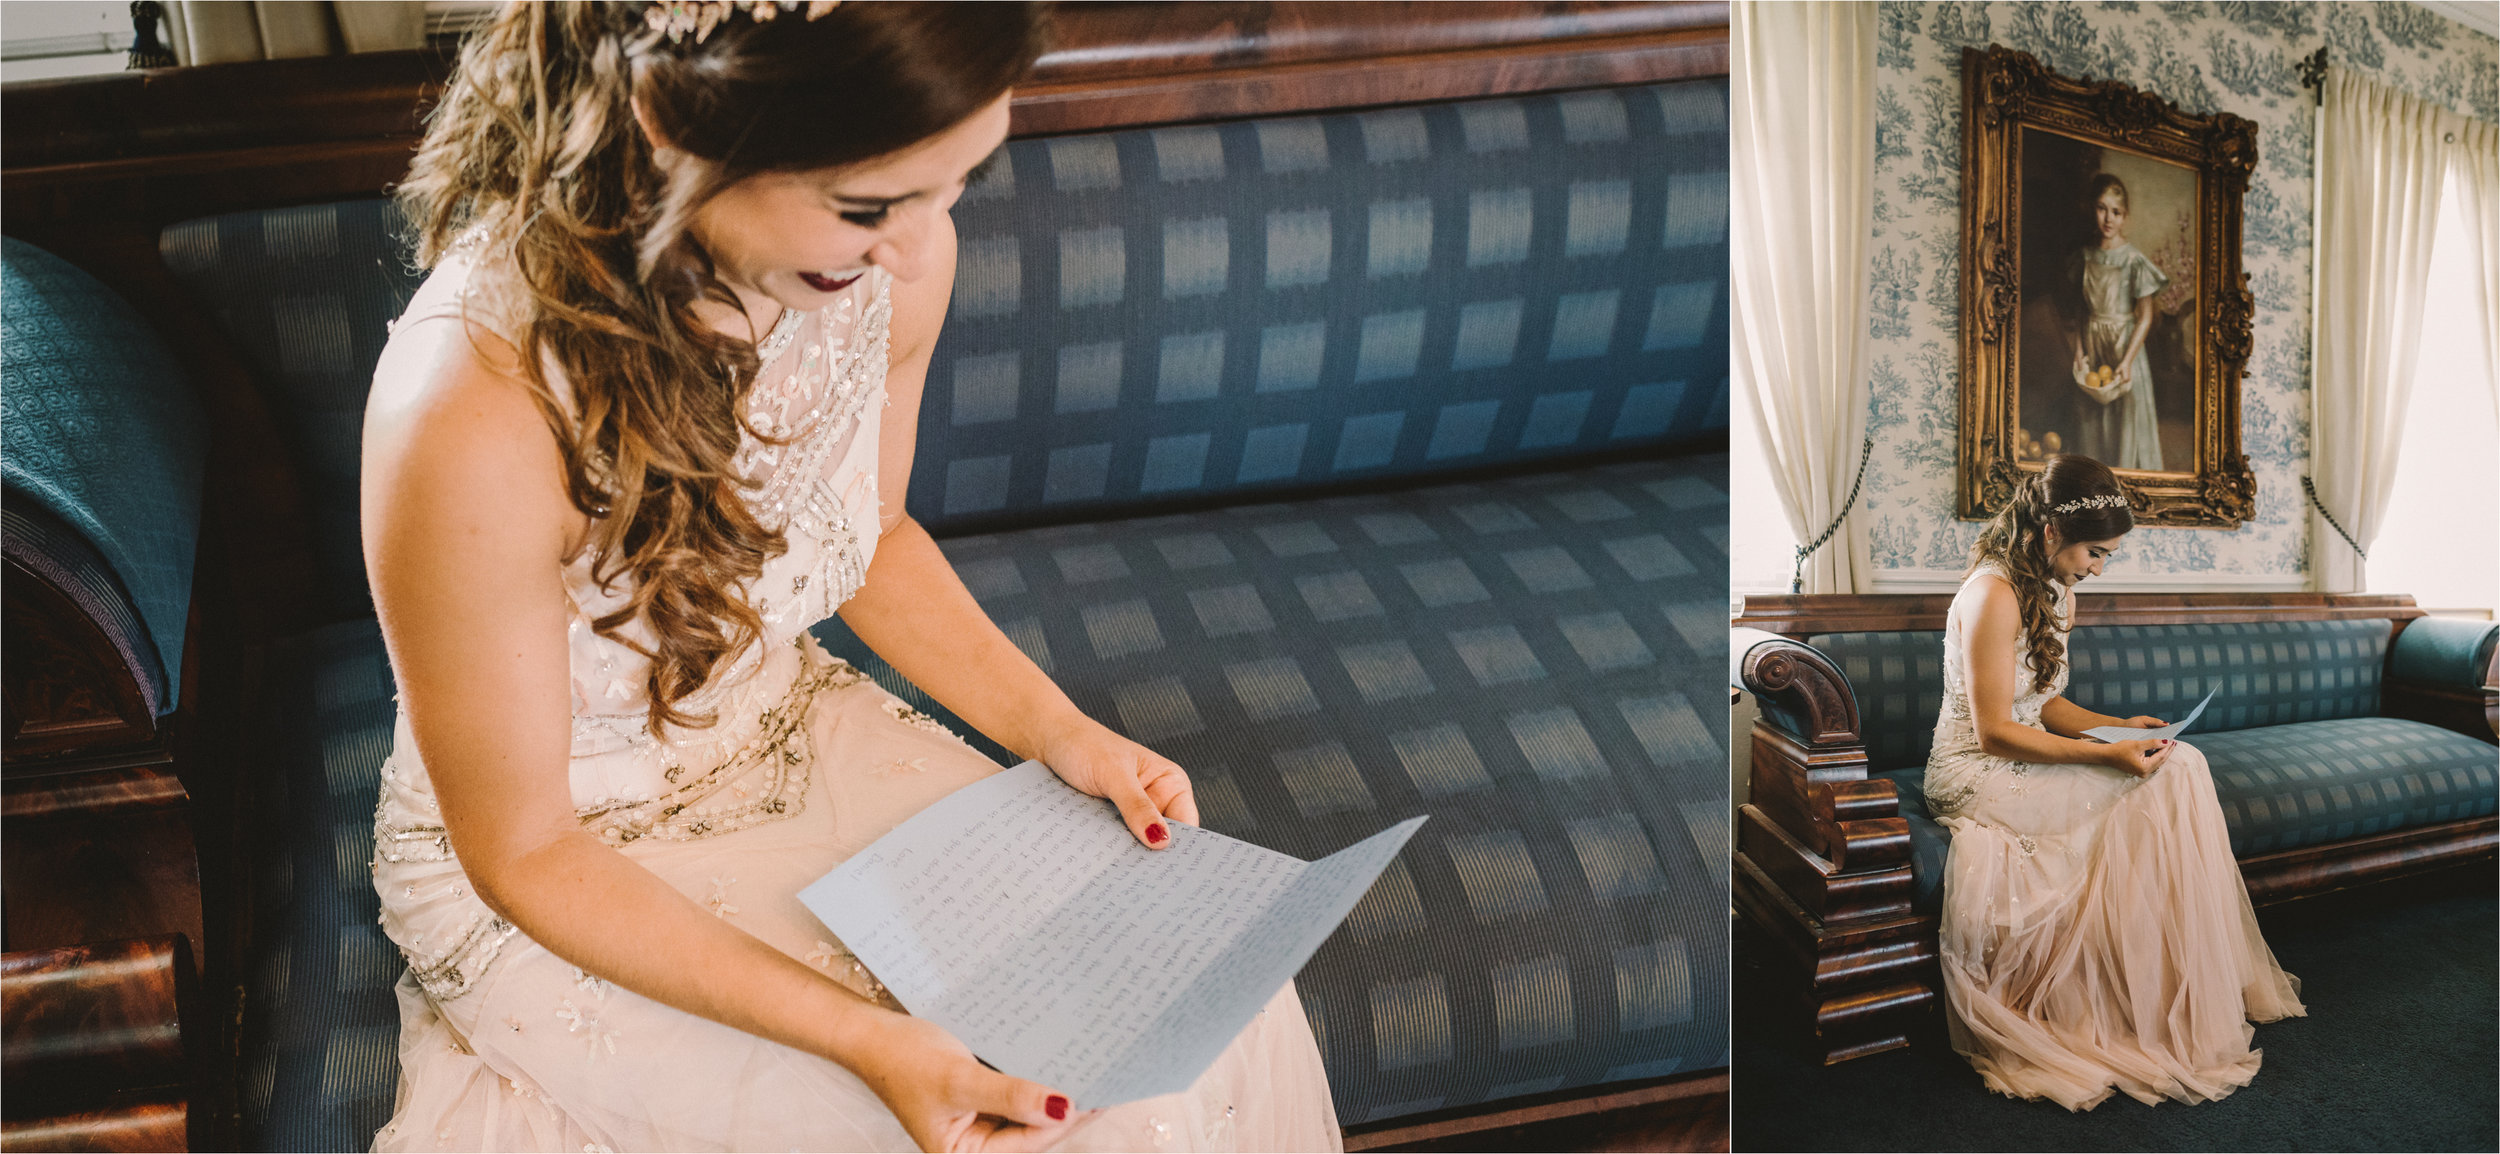 Barbara O Photography antrim 1844 wedding bridal party blush dresses3.jpg